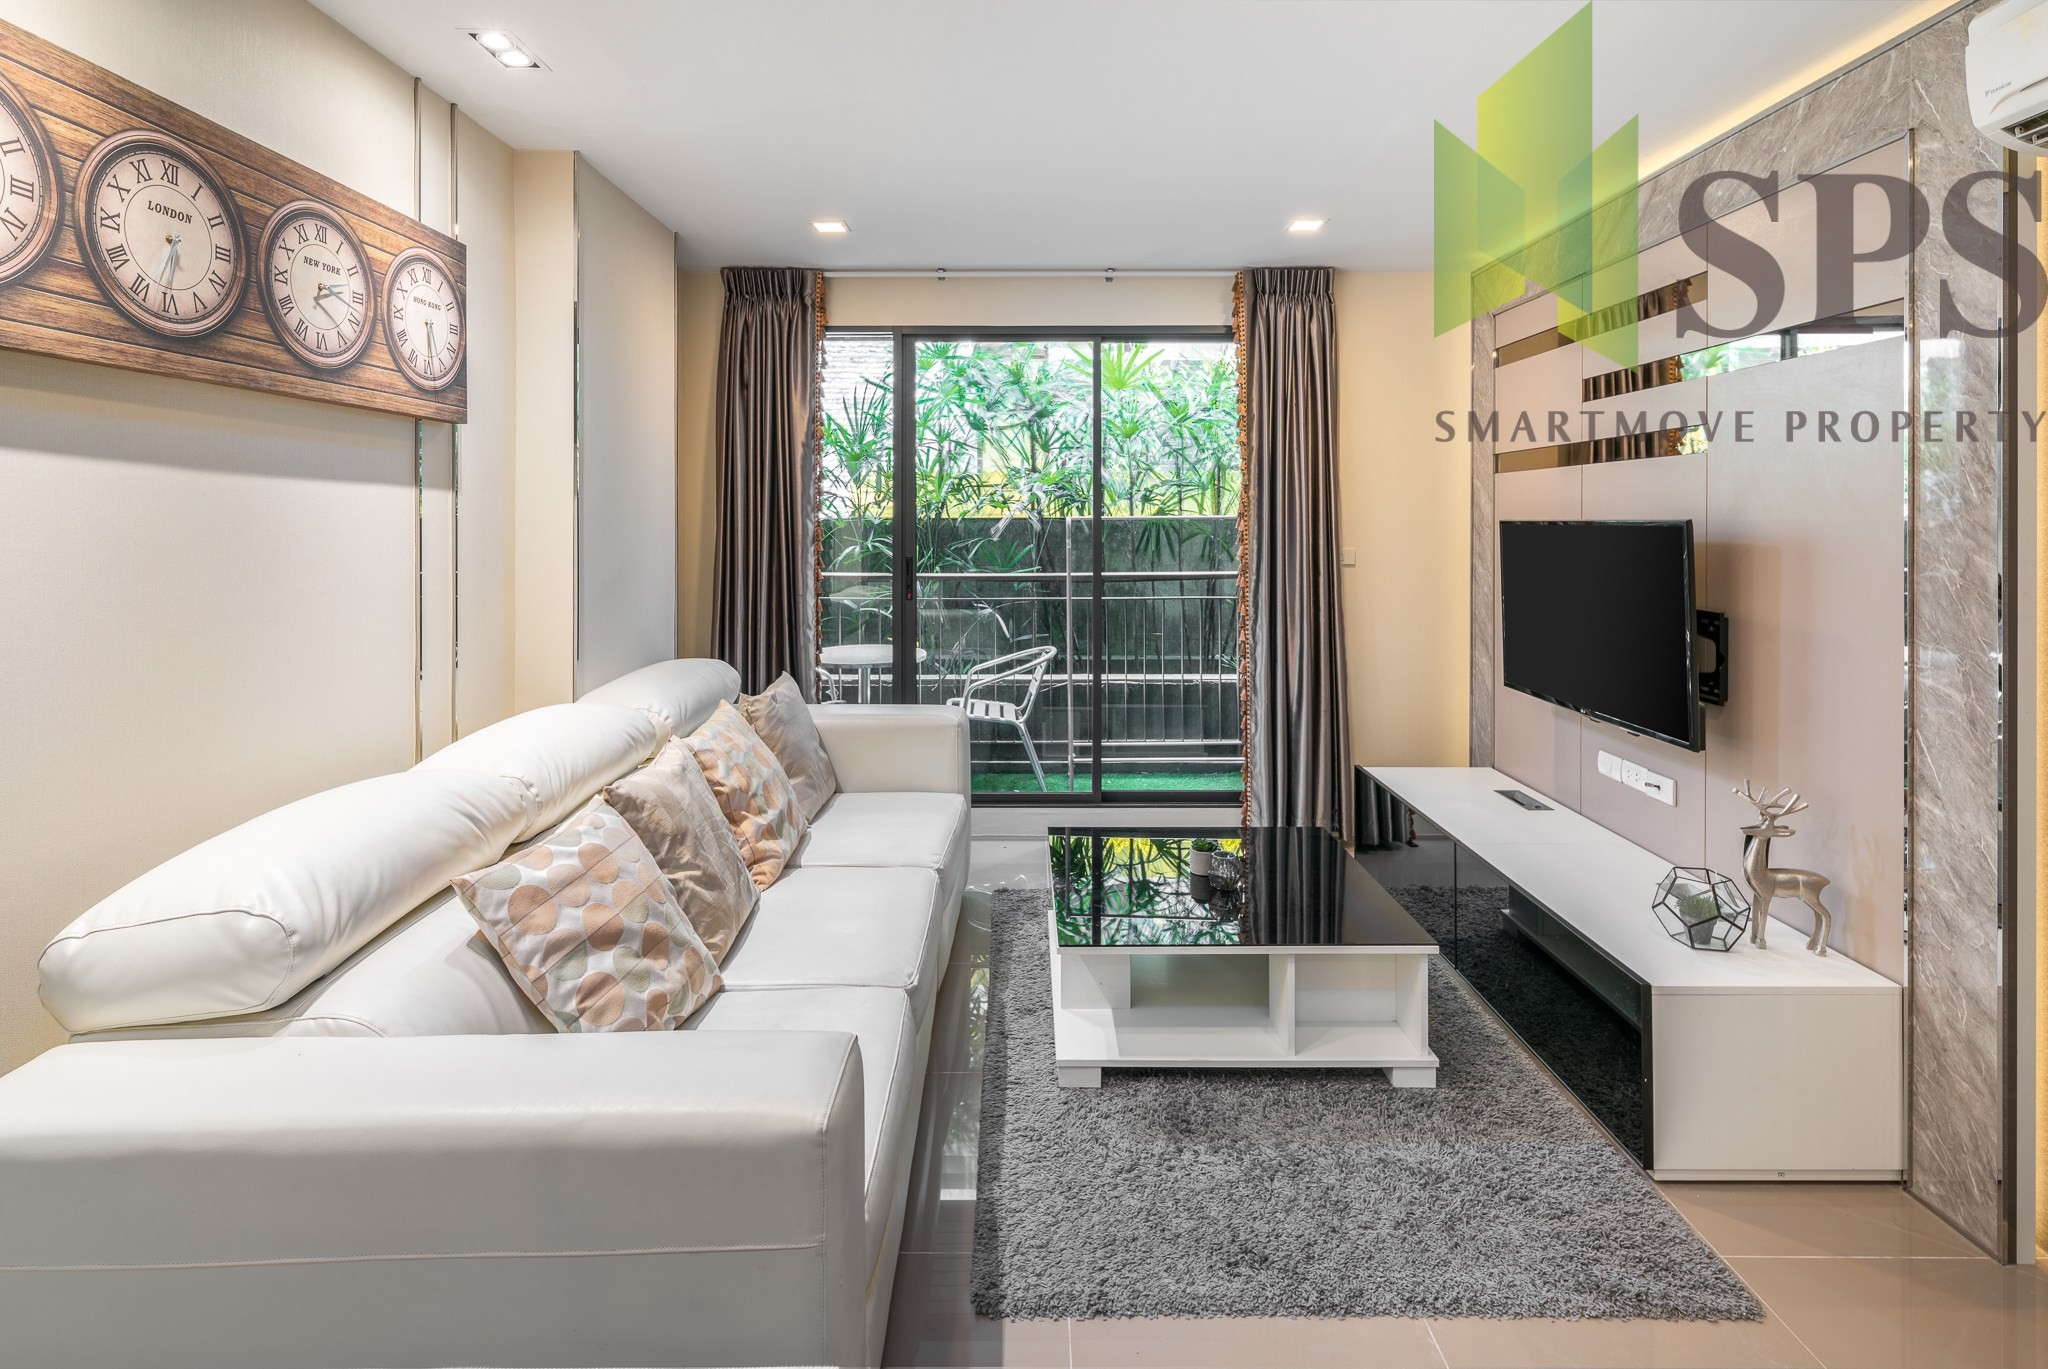 For Rent / Sale Condo Mirage Sukhumvit 27/ ให้เช่า และ ขาย คอนโด มิราจ สุขุมวิท 27 (Property ID: SPS-PP325)